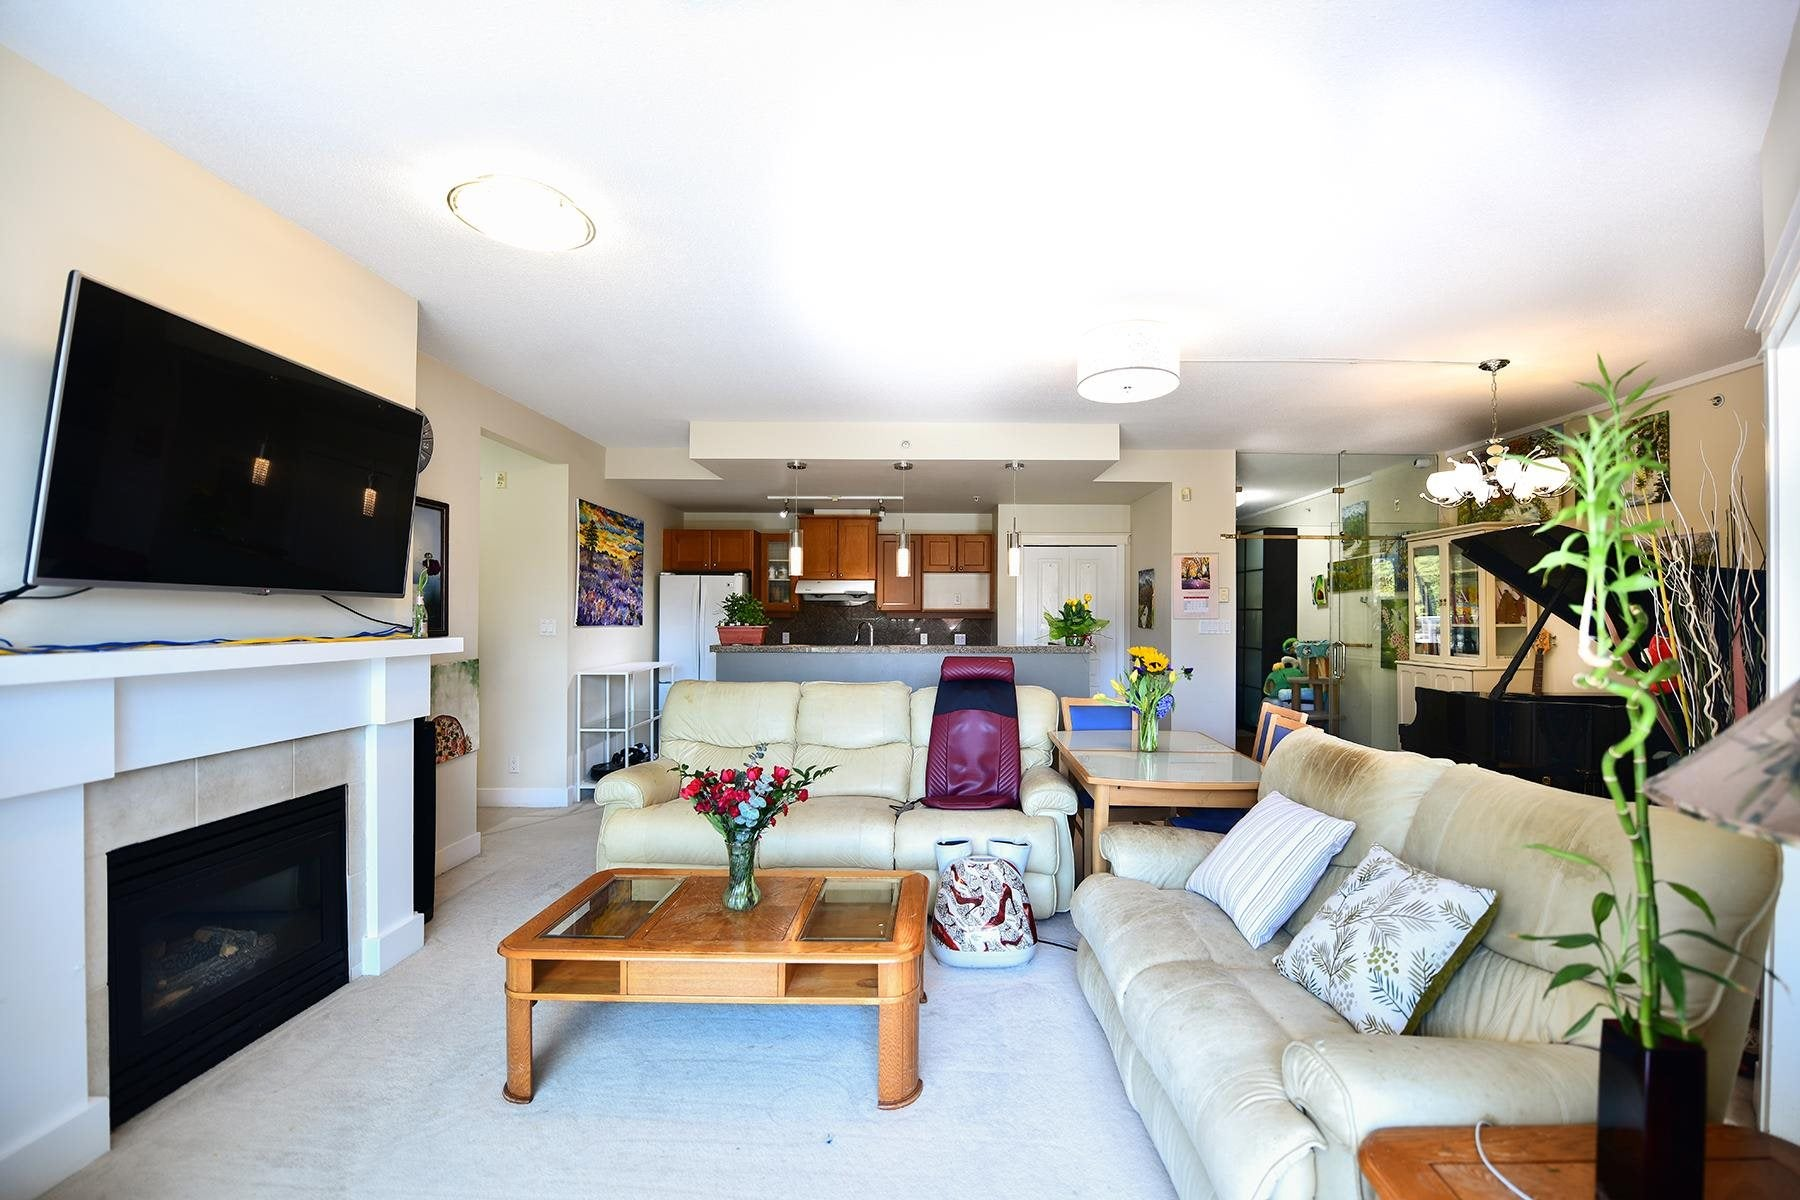 204 5790 EAST BOULEVARD - Kerrisdale Apartment/Condo for sale, 3 Bedrooms (R2604138) - #3